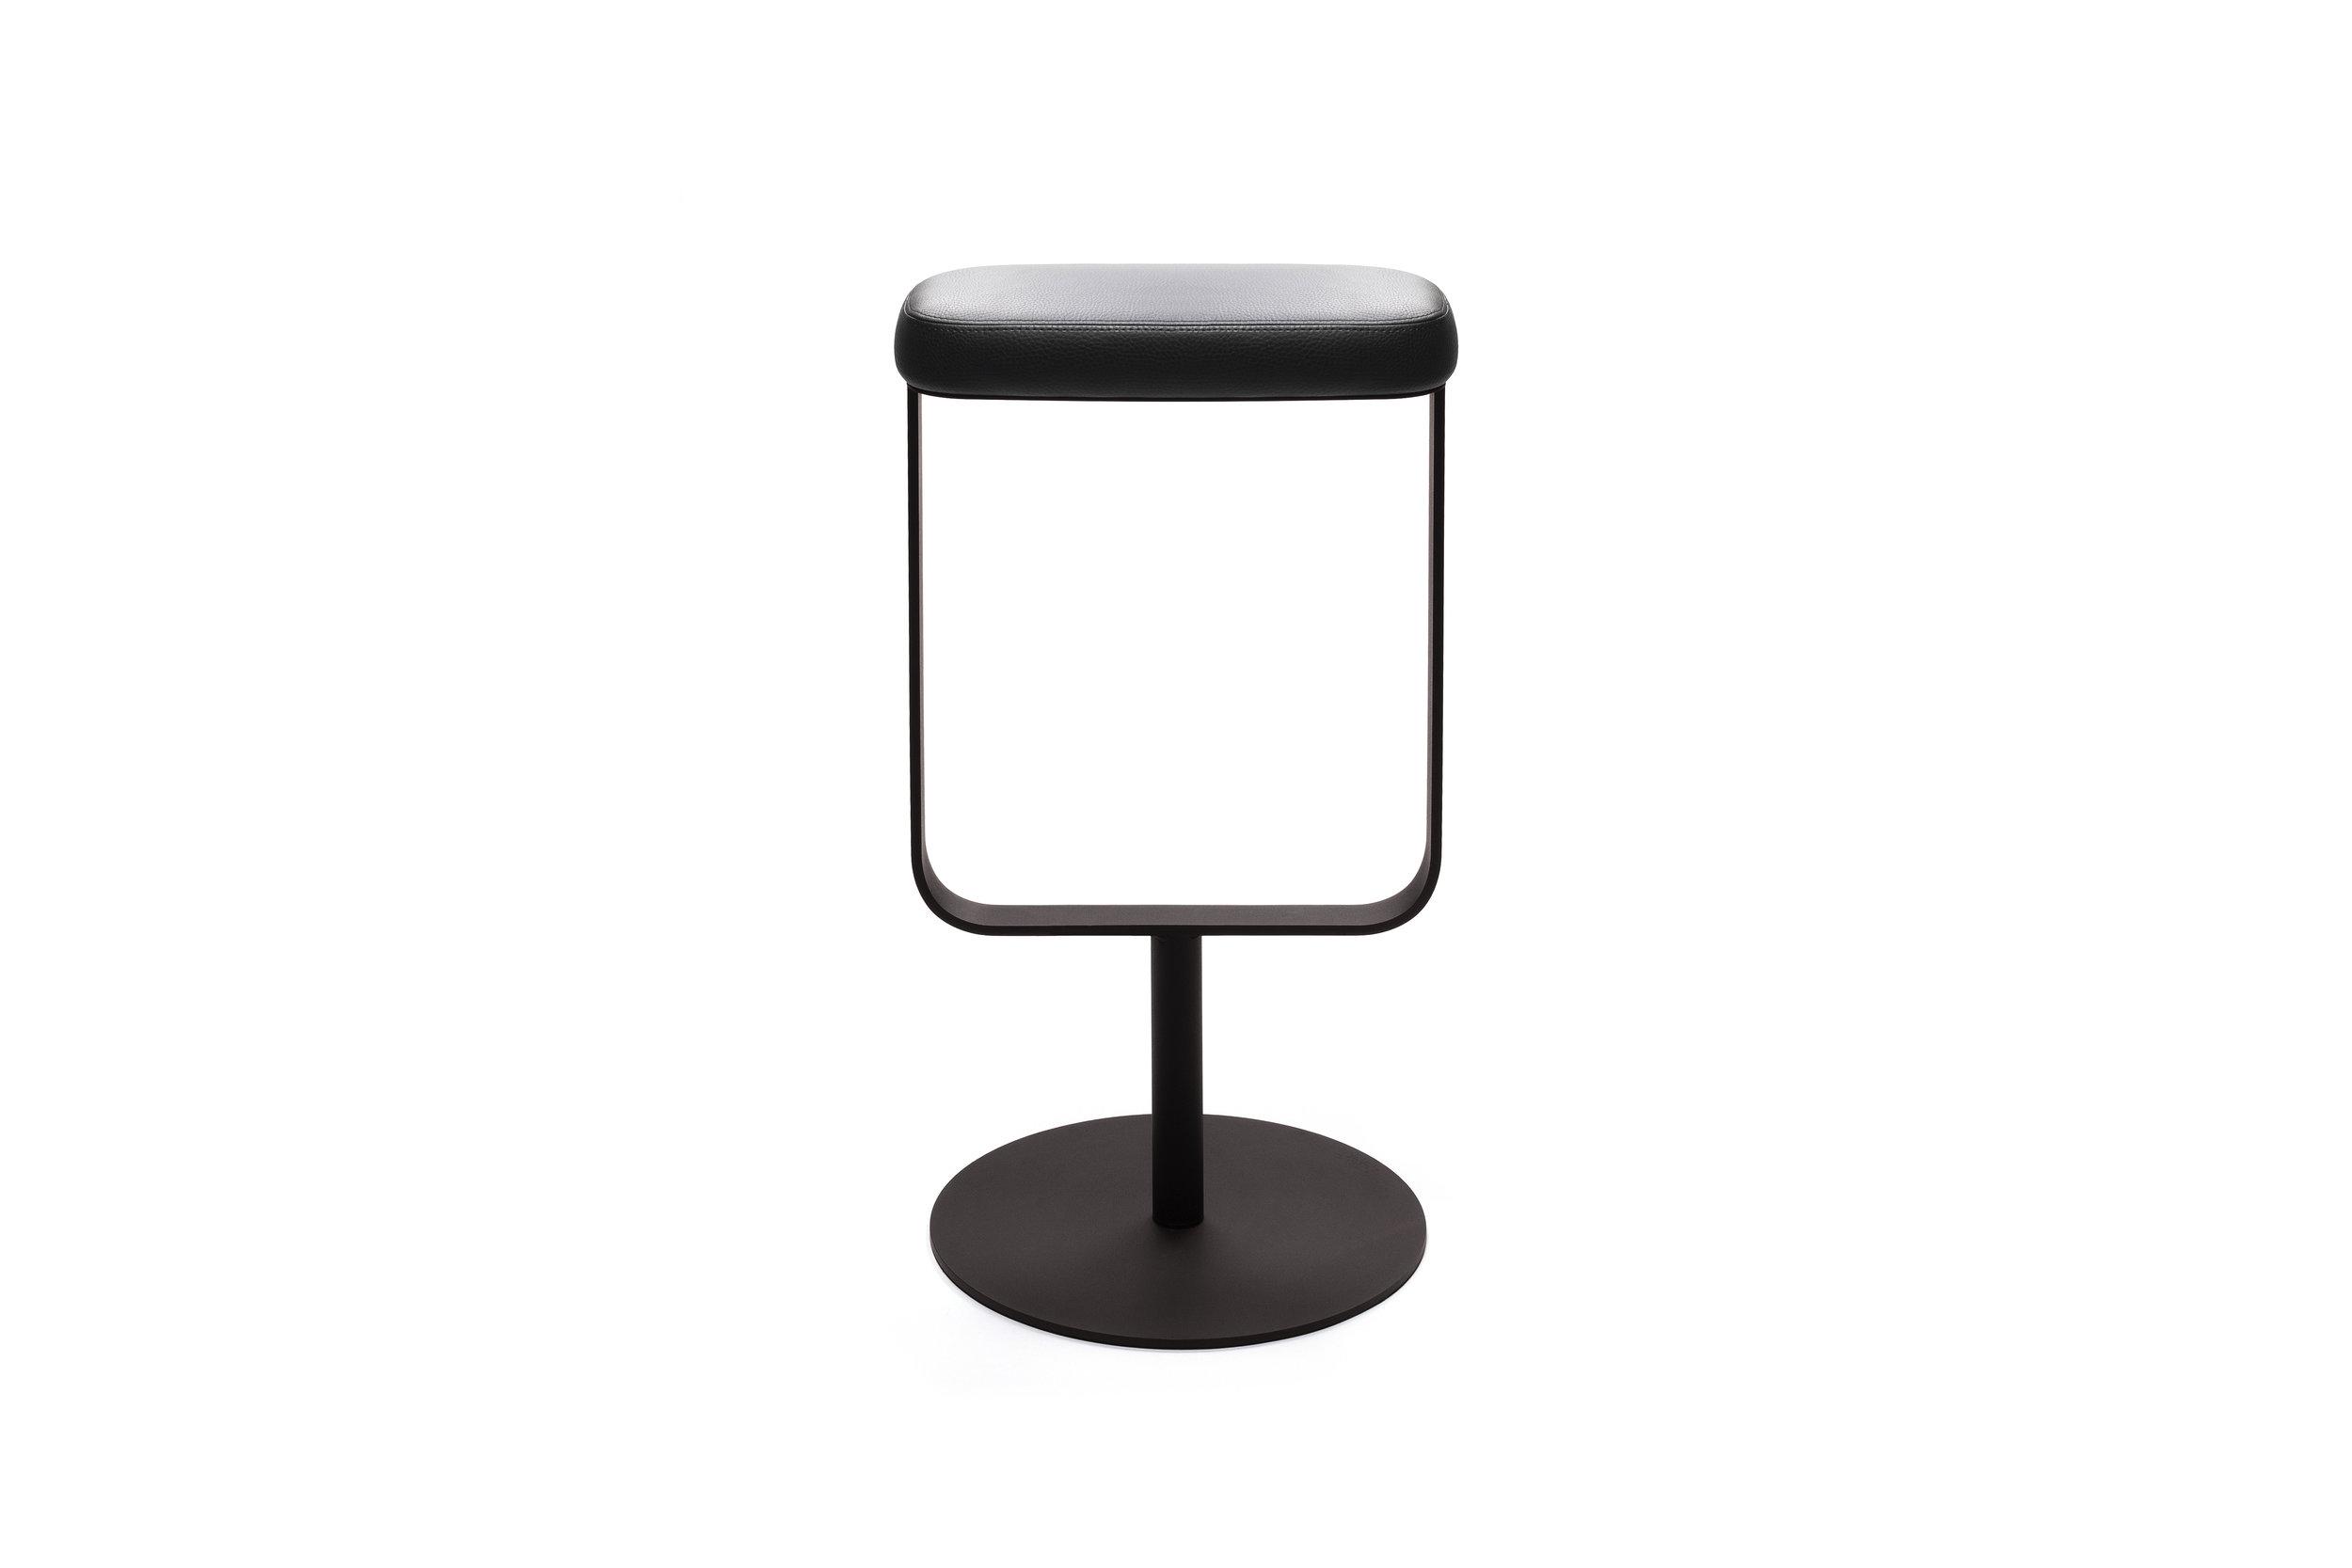 OBJEKTEN_Slim_Bar stool_AlainBerteau_4.jpg